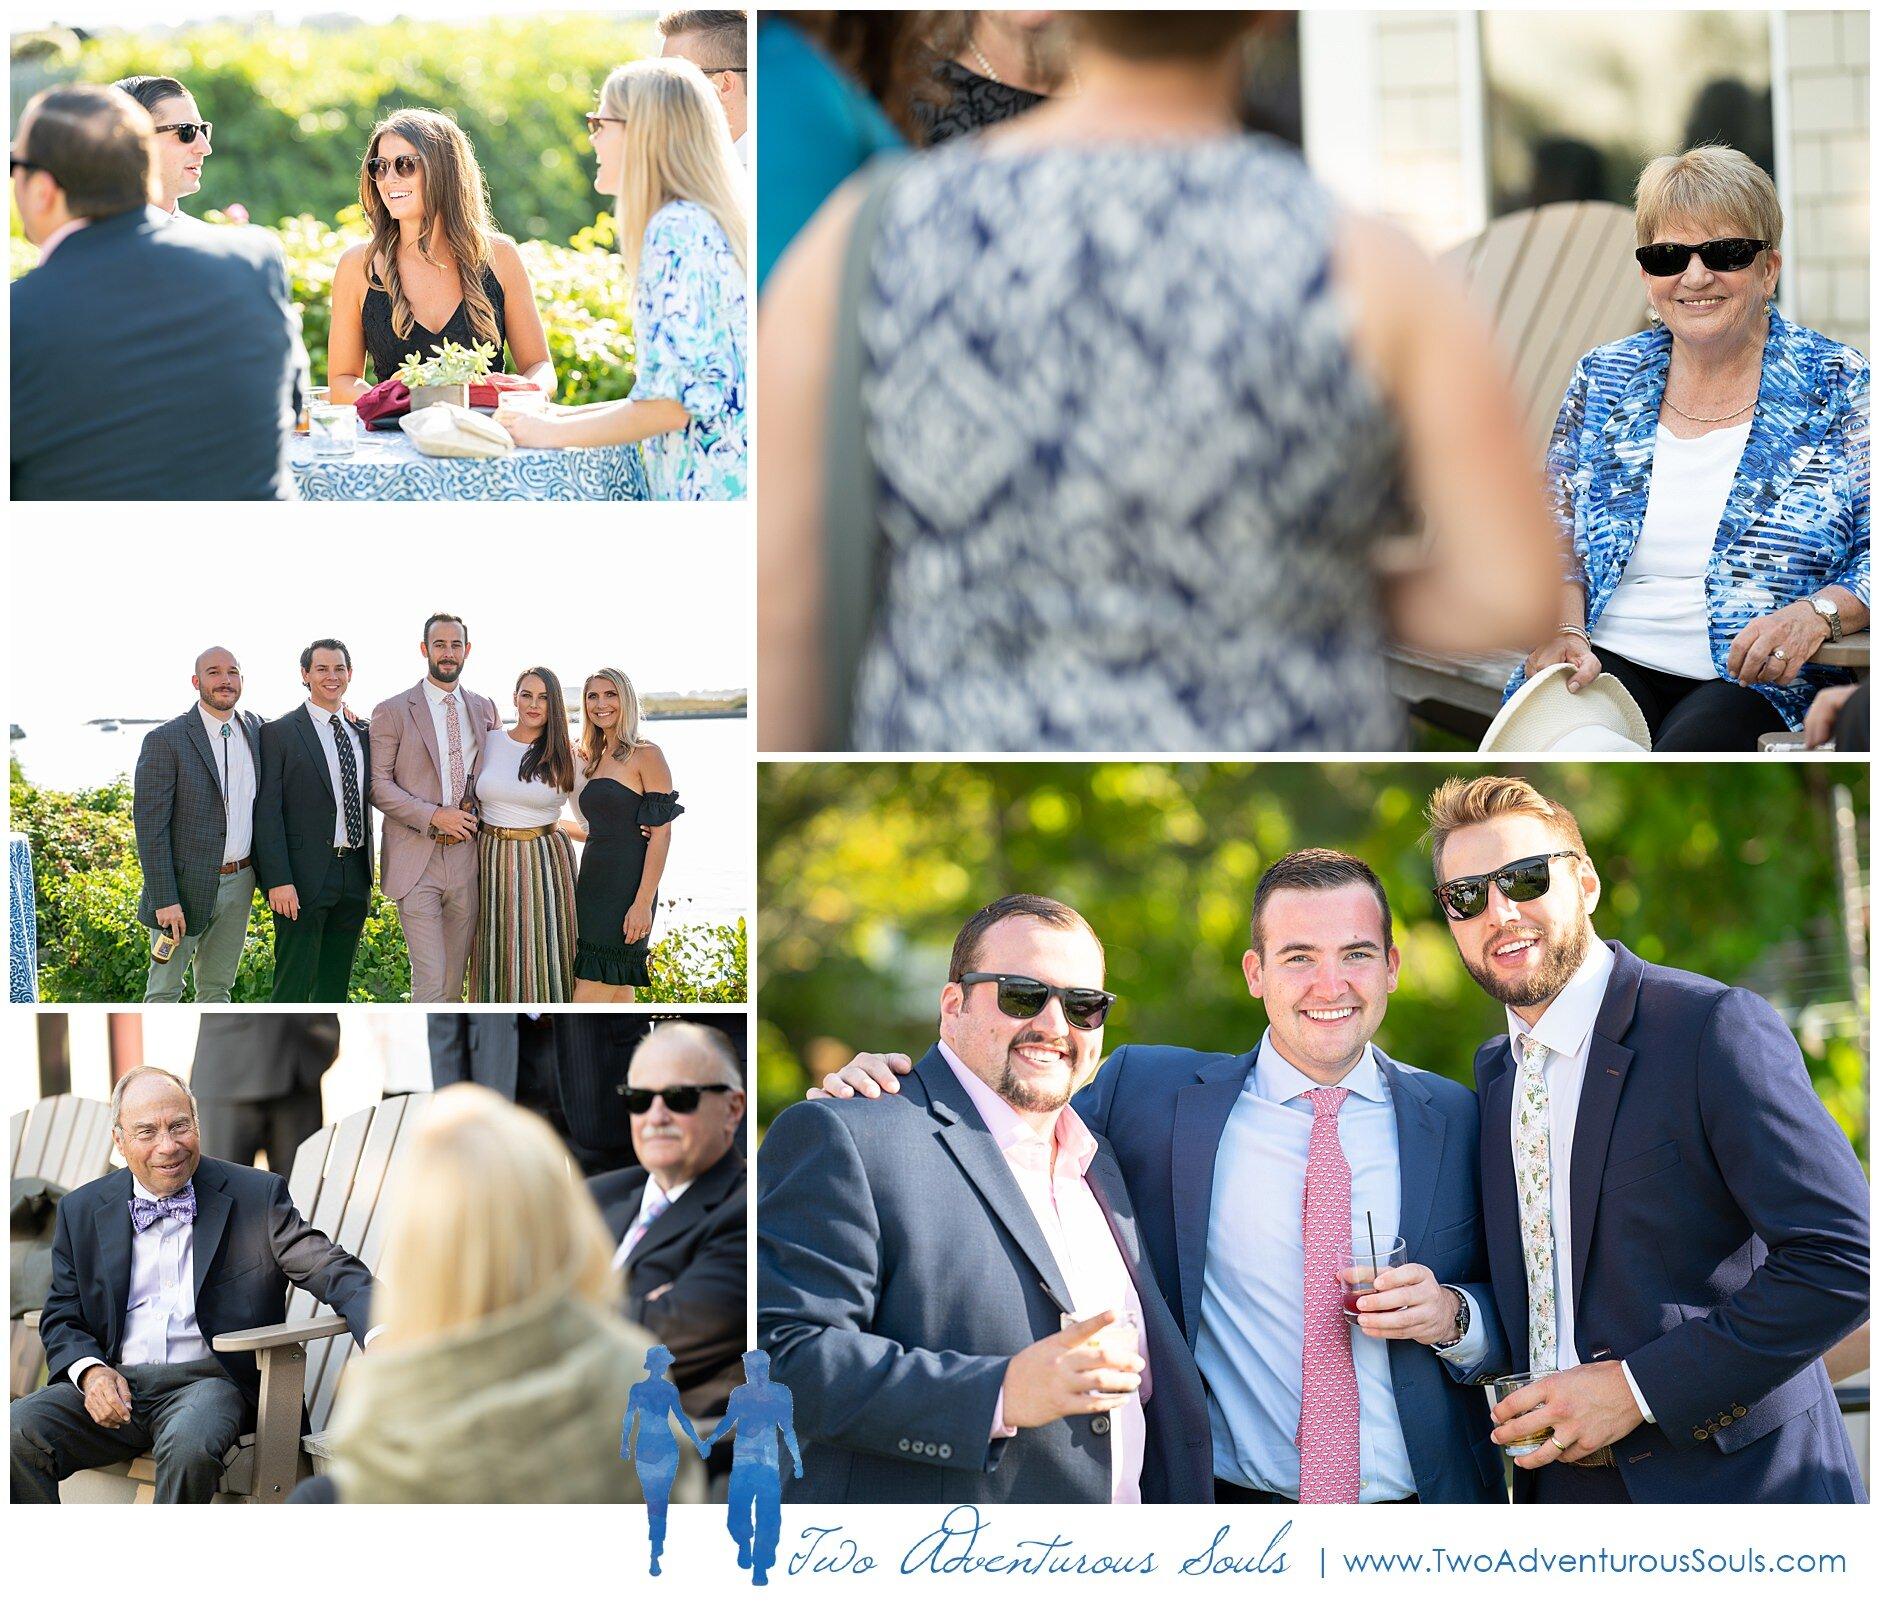 Breakwater Inn and Spa Wedding Photographers, Kennebunkport Wedding Photographers, Two Adventurous Souls- 092119_0039.jpg